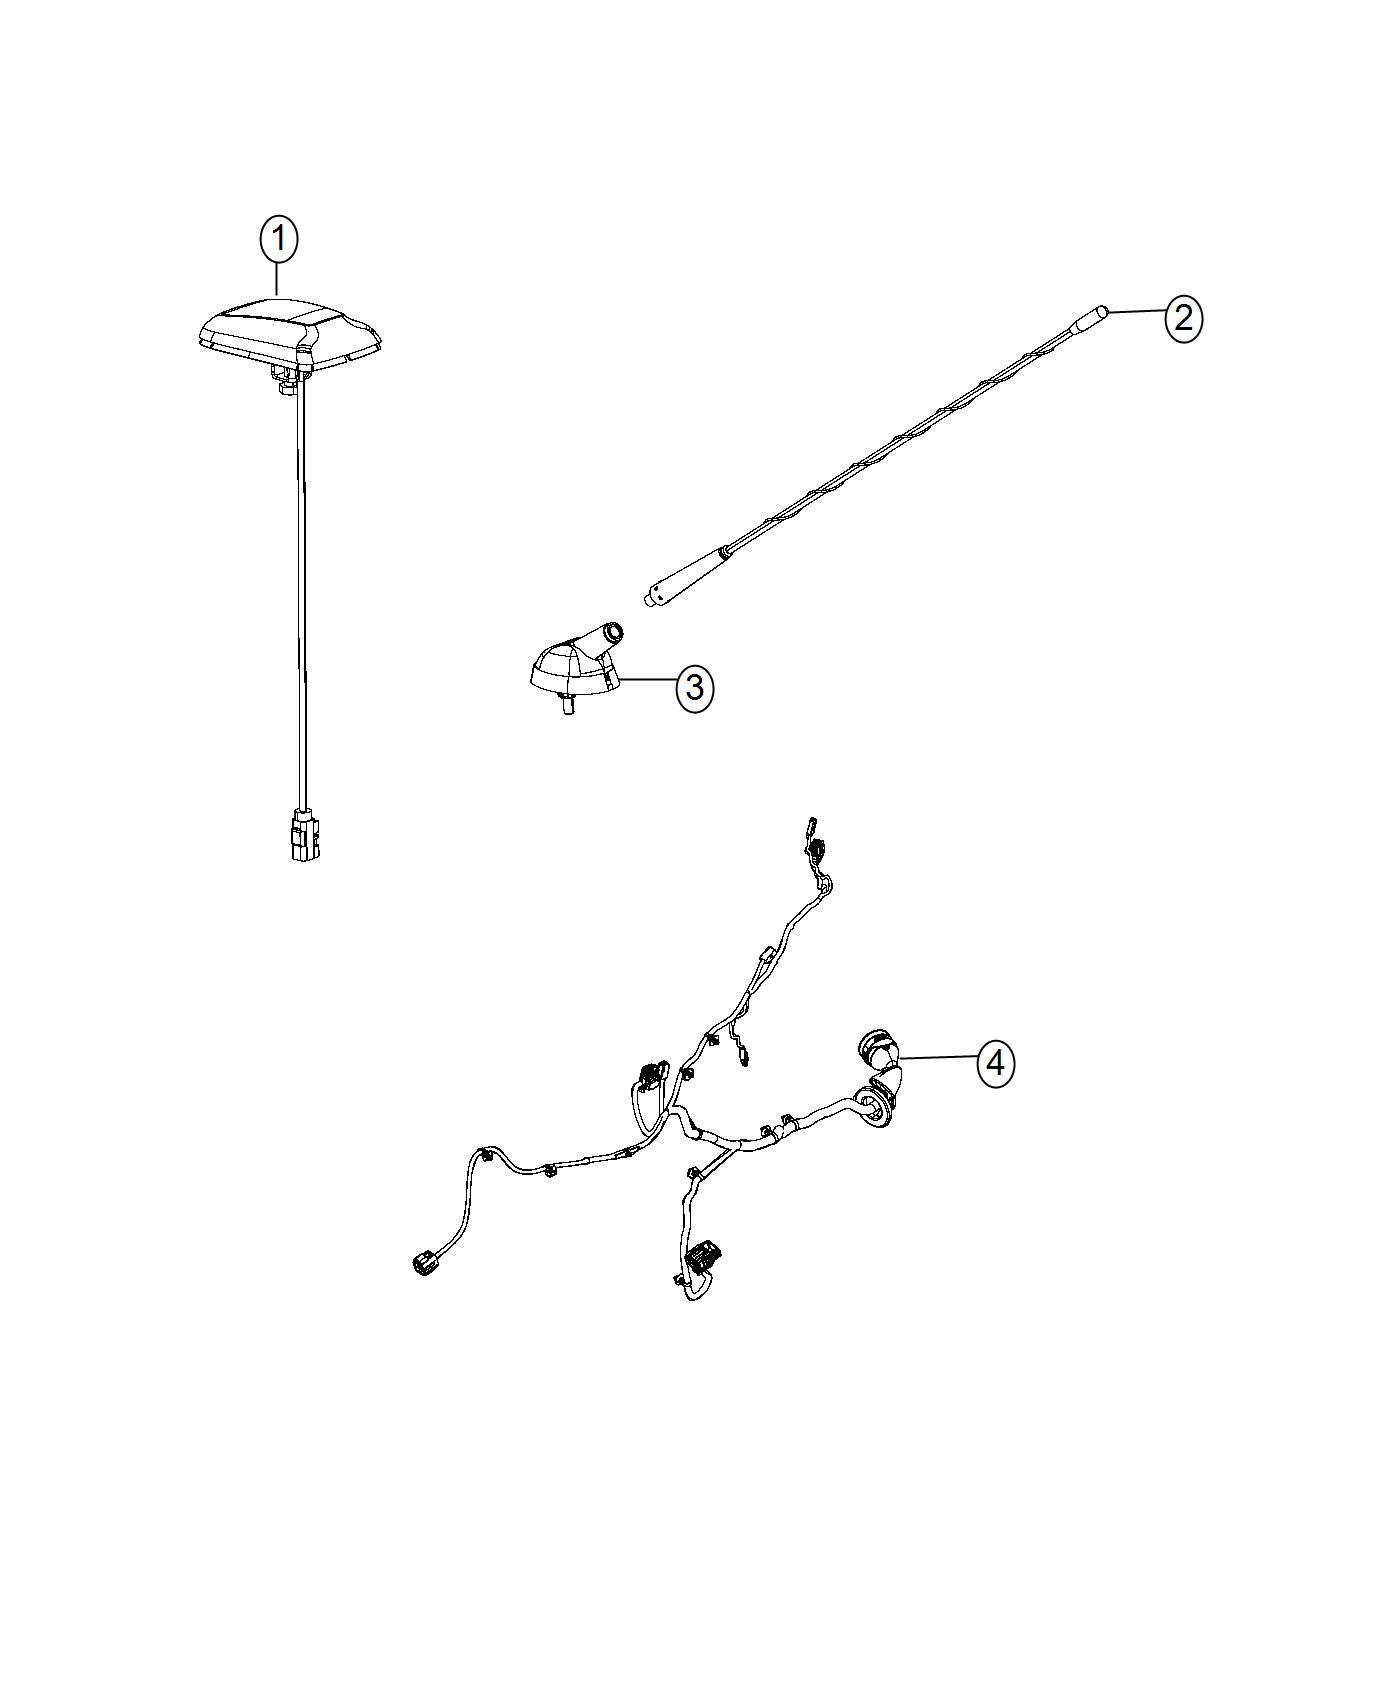 2016 ram promaster city wagon slt mast antenna radio. Black Bedroom Furniture Sets. Home Design Ideas